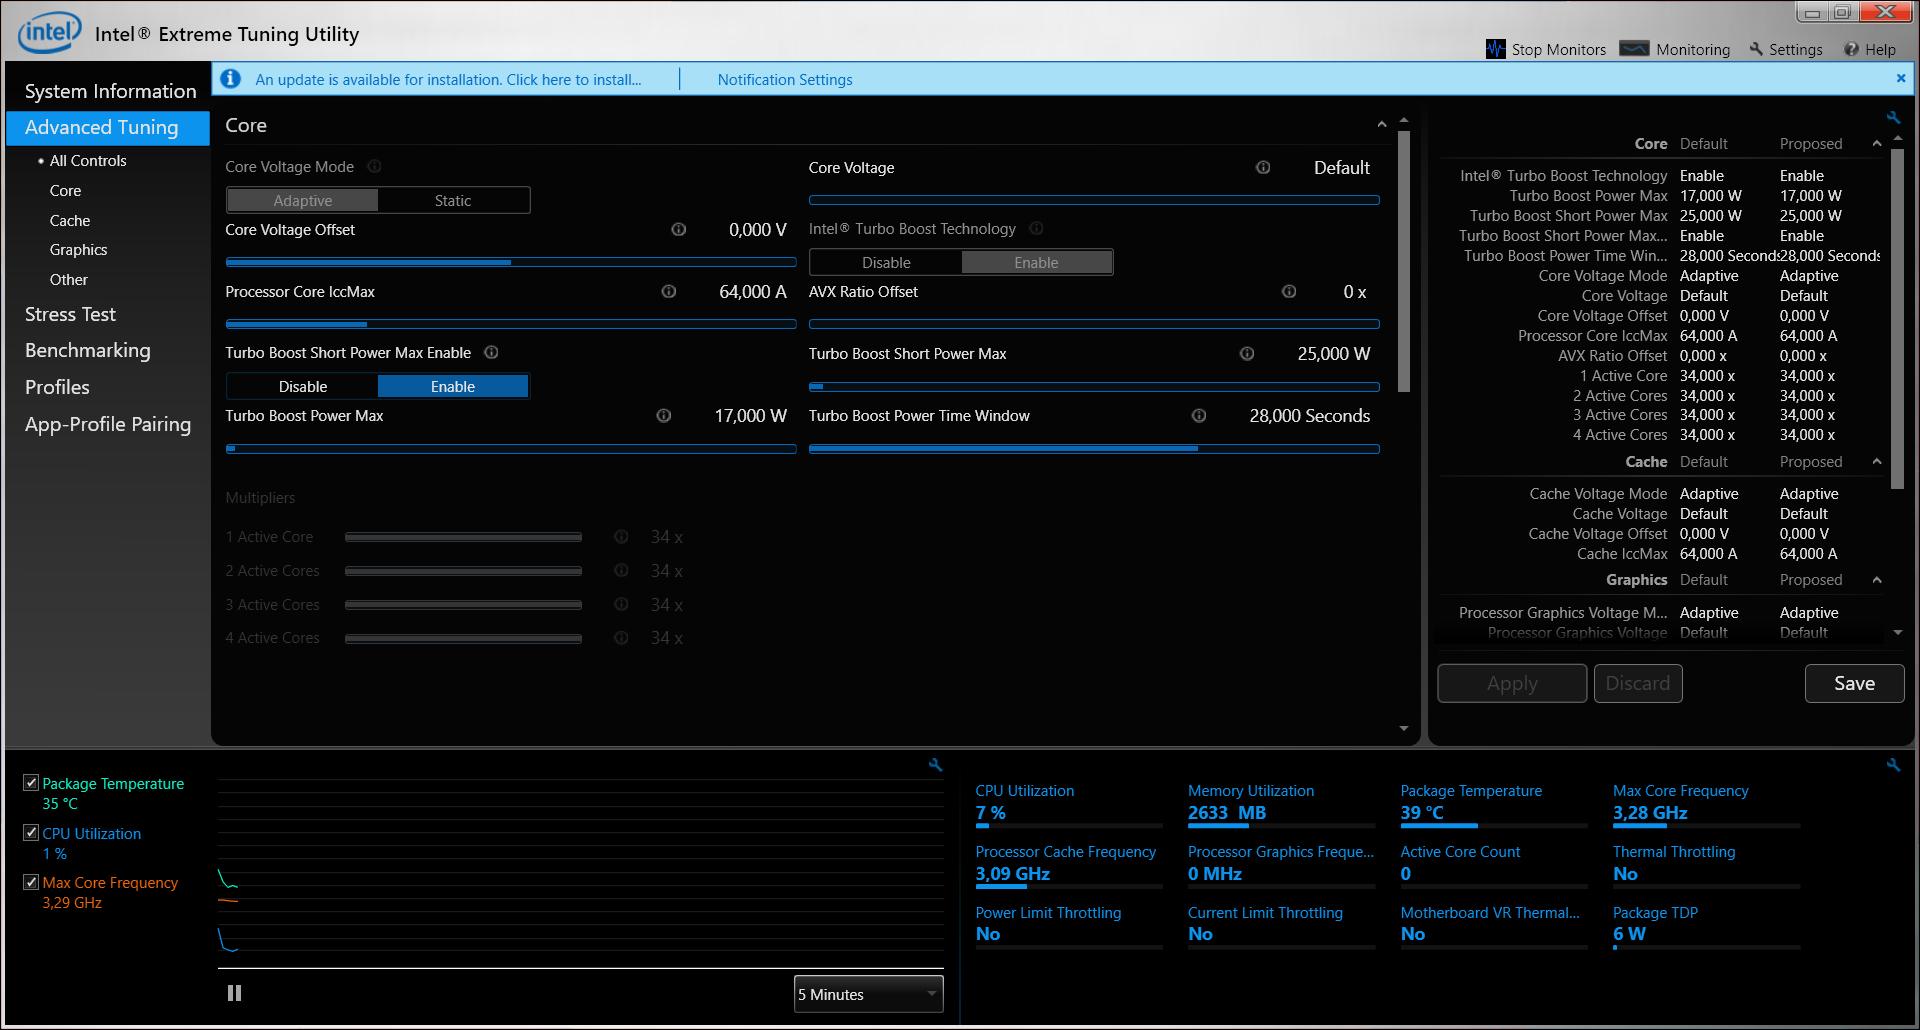 HP 15 (i5-8250U, GeForce MX110, SSD, FHD) Laptop Review